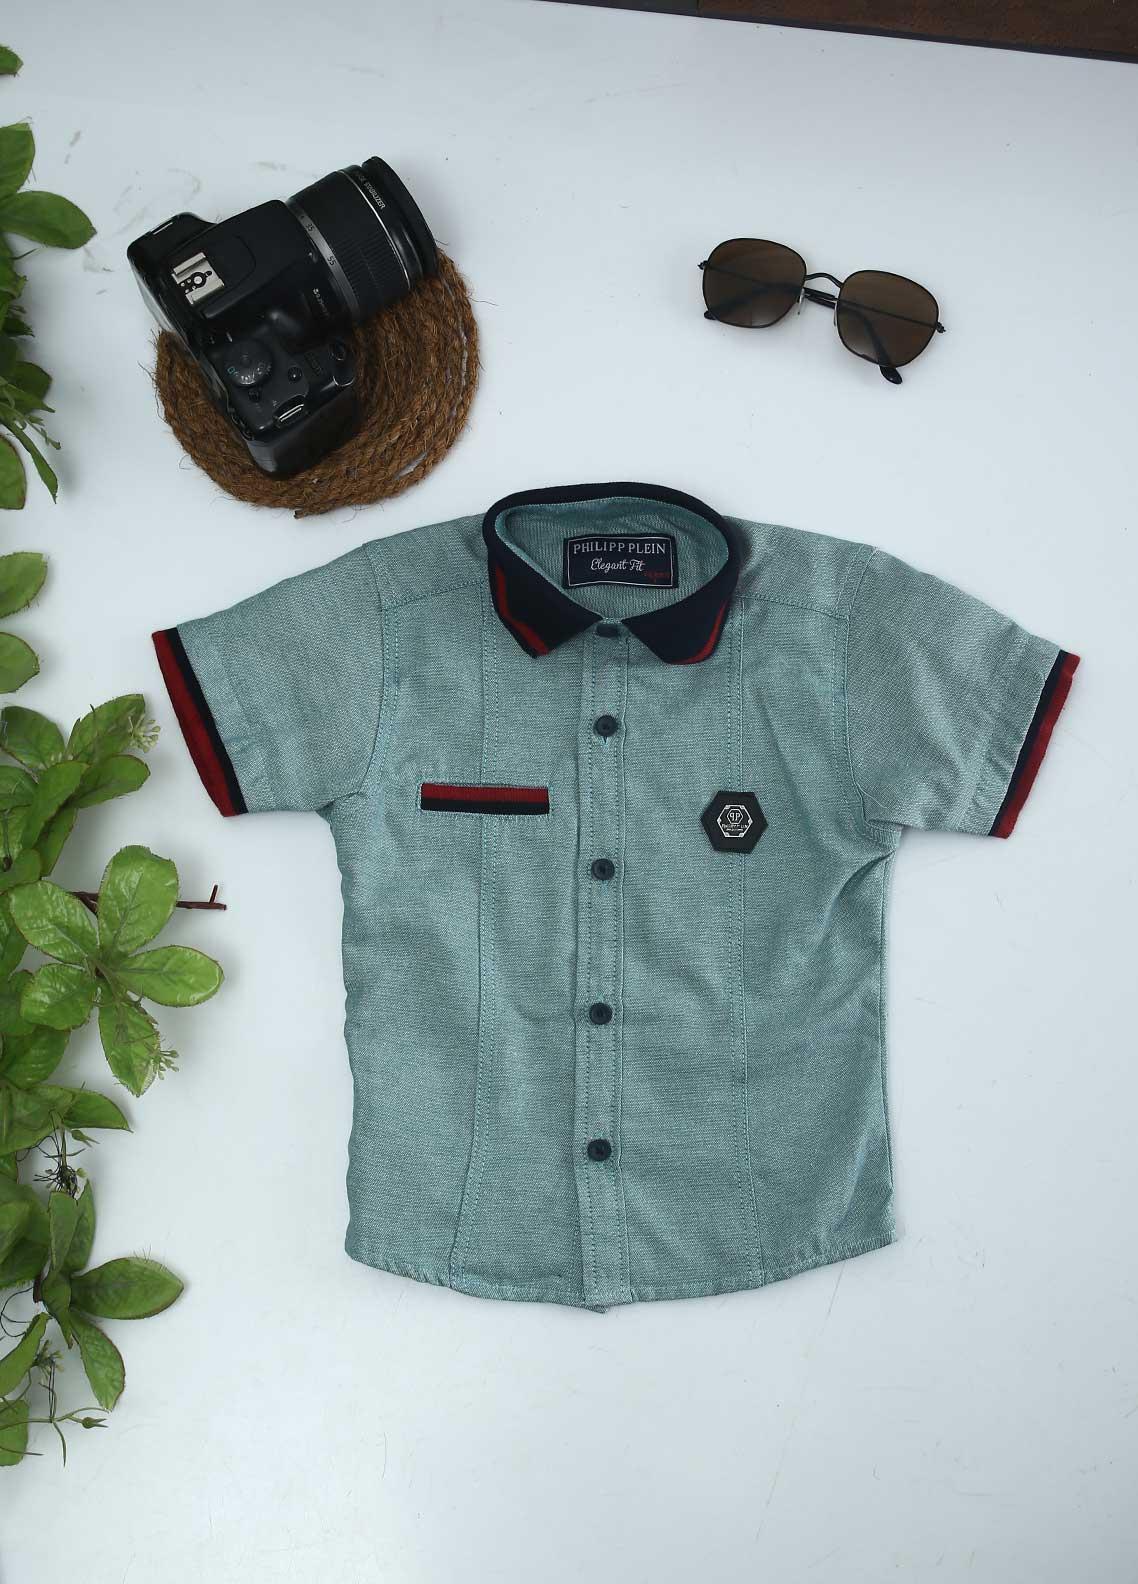 Sanaulla Exclusive Range Cotton Fancy Shirts for Boys -  51 Green